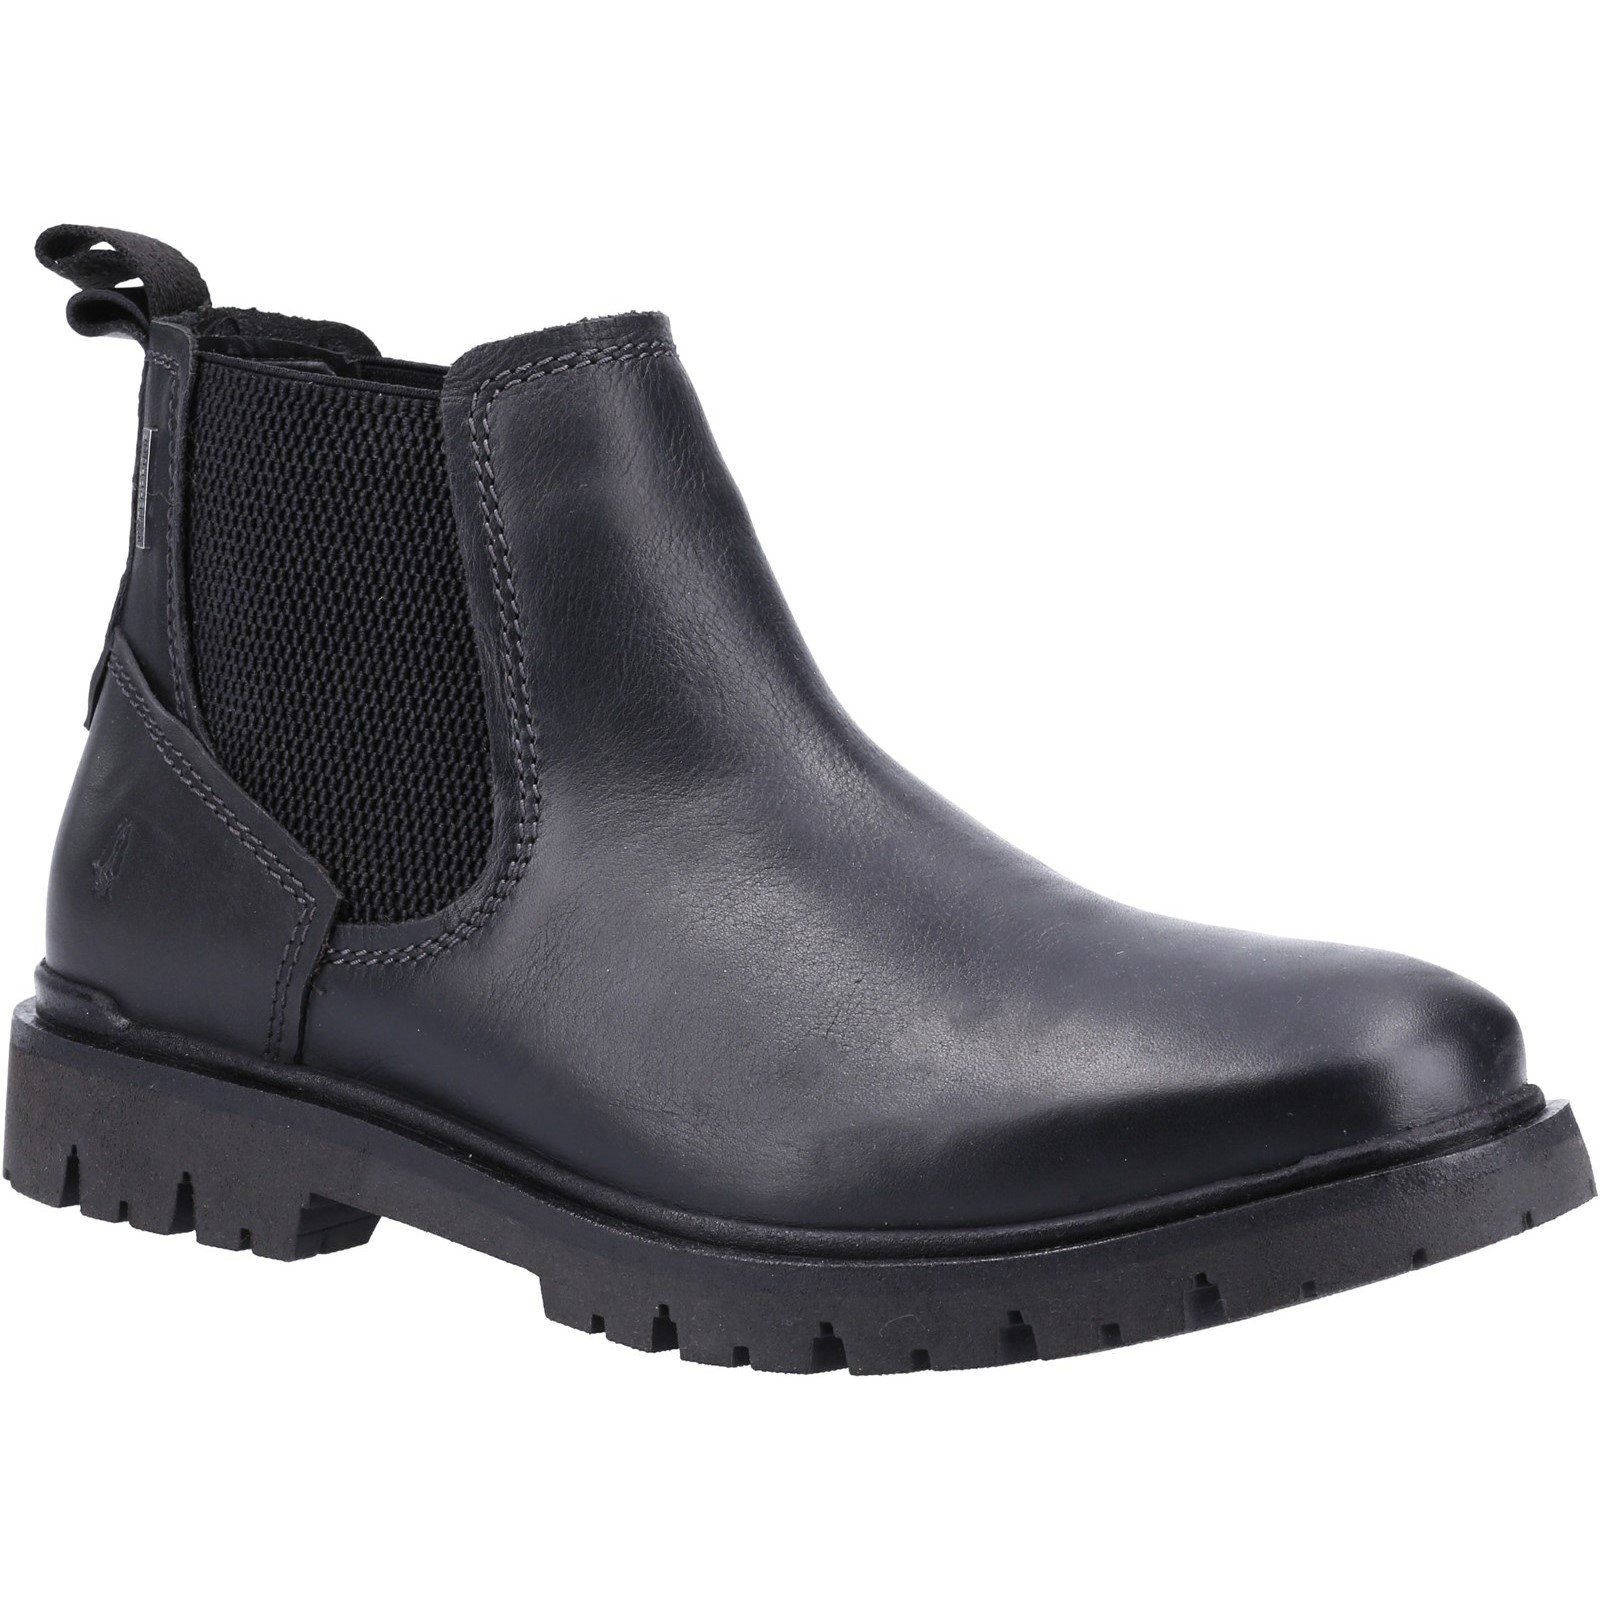 Hush Puppies Men's Paxton Chelsea Boot Various Colours 32882 - Black 9